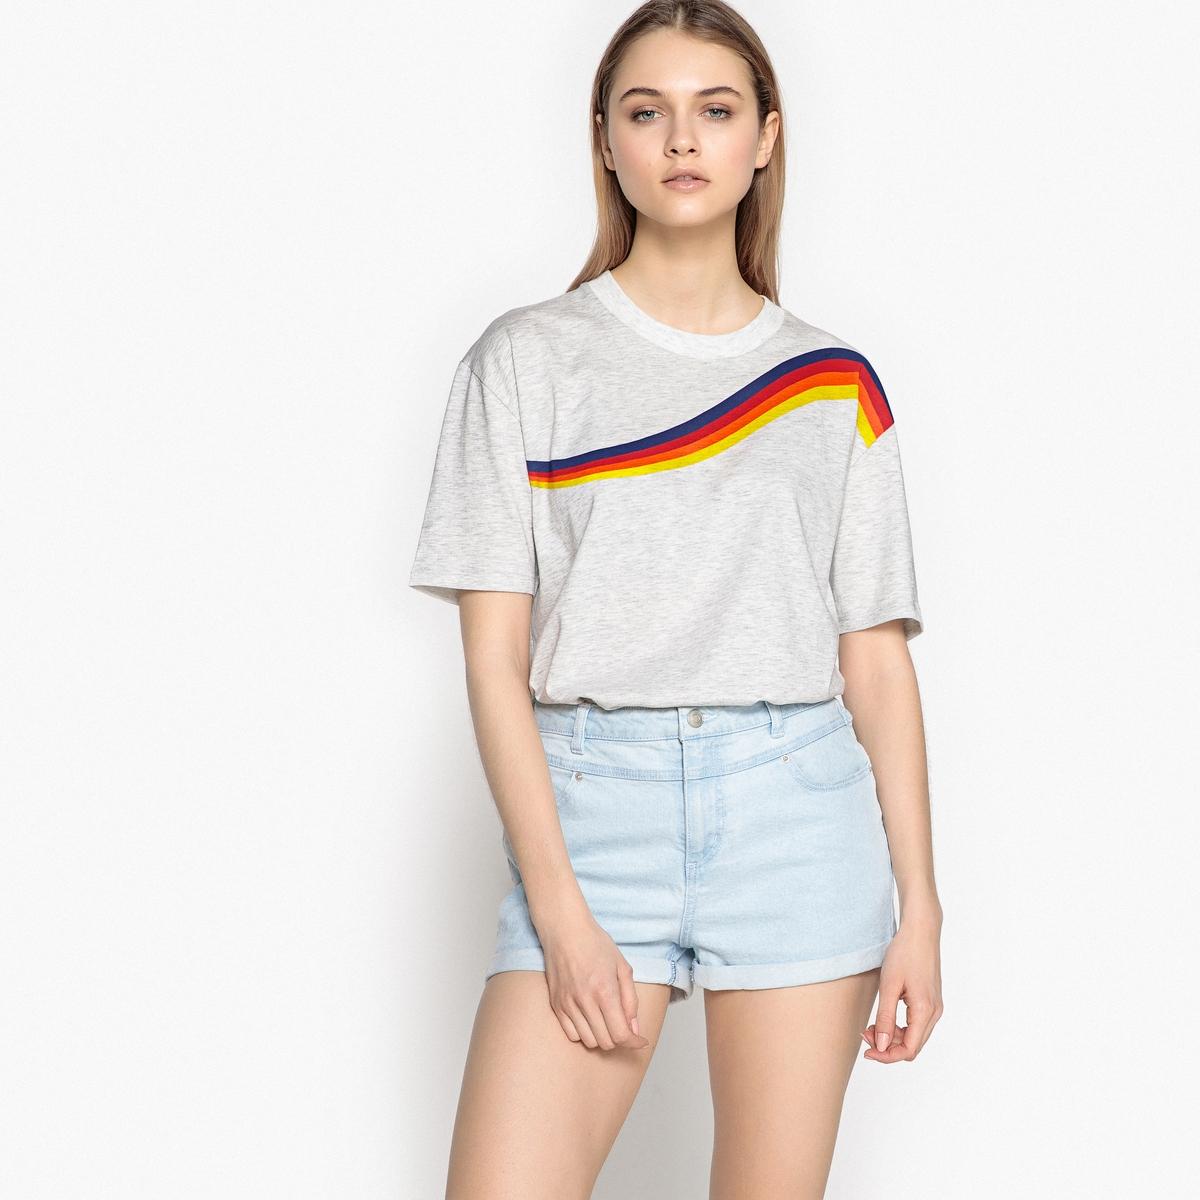 T-shirt estampada, gola redonda, mangas curtas